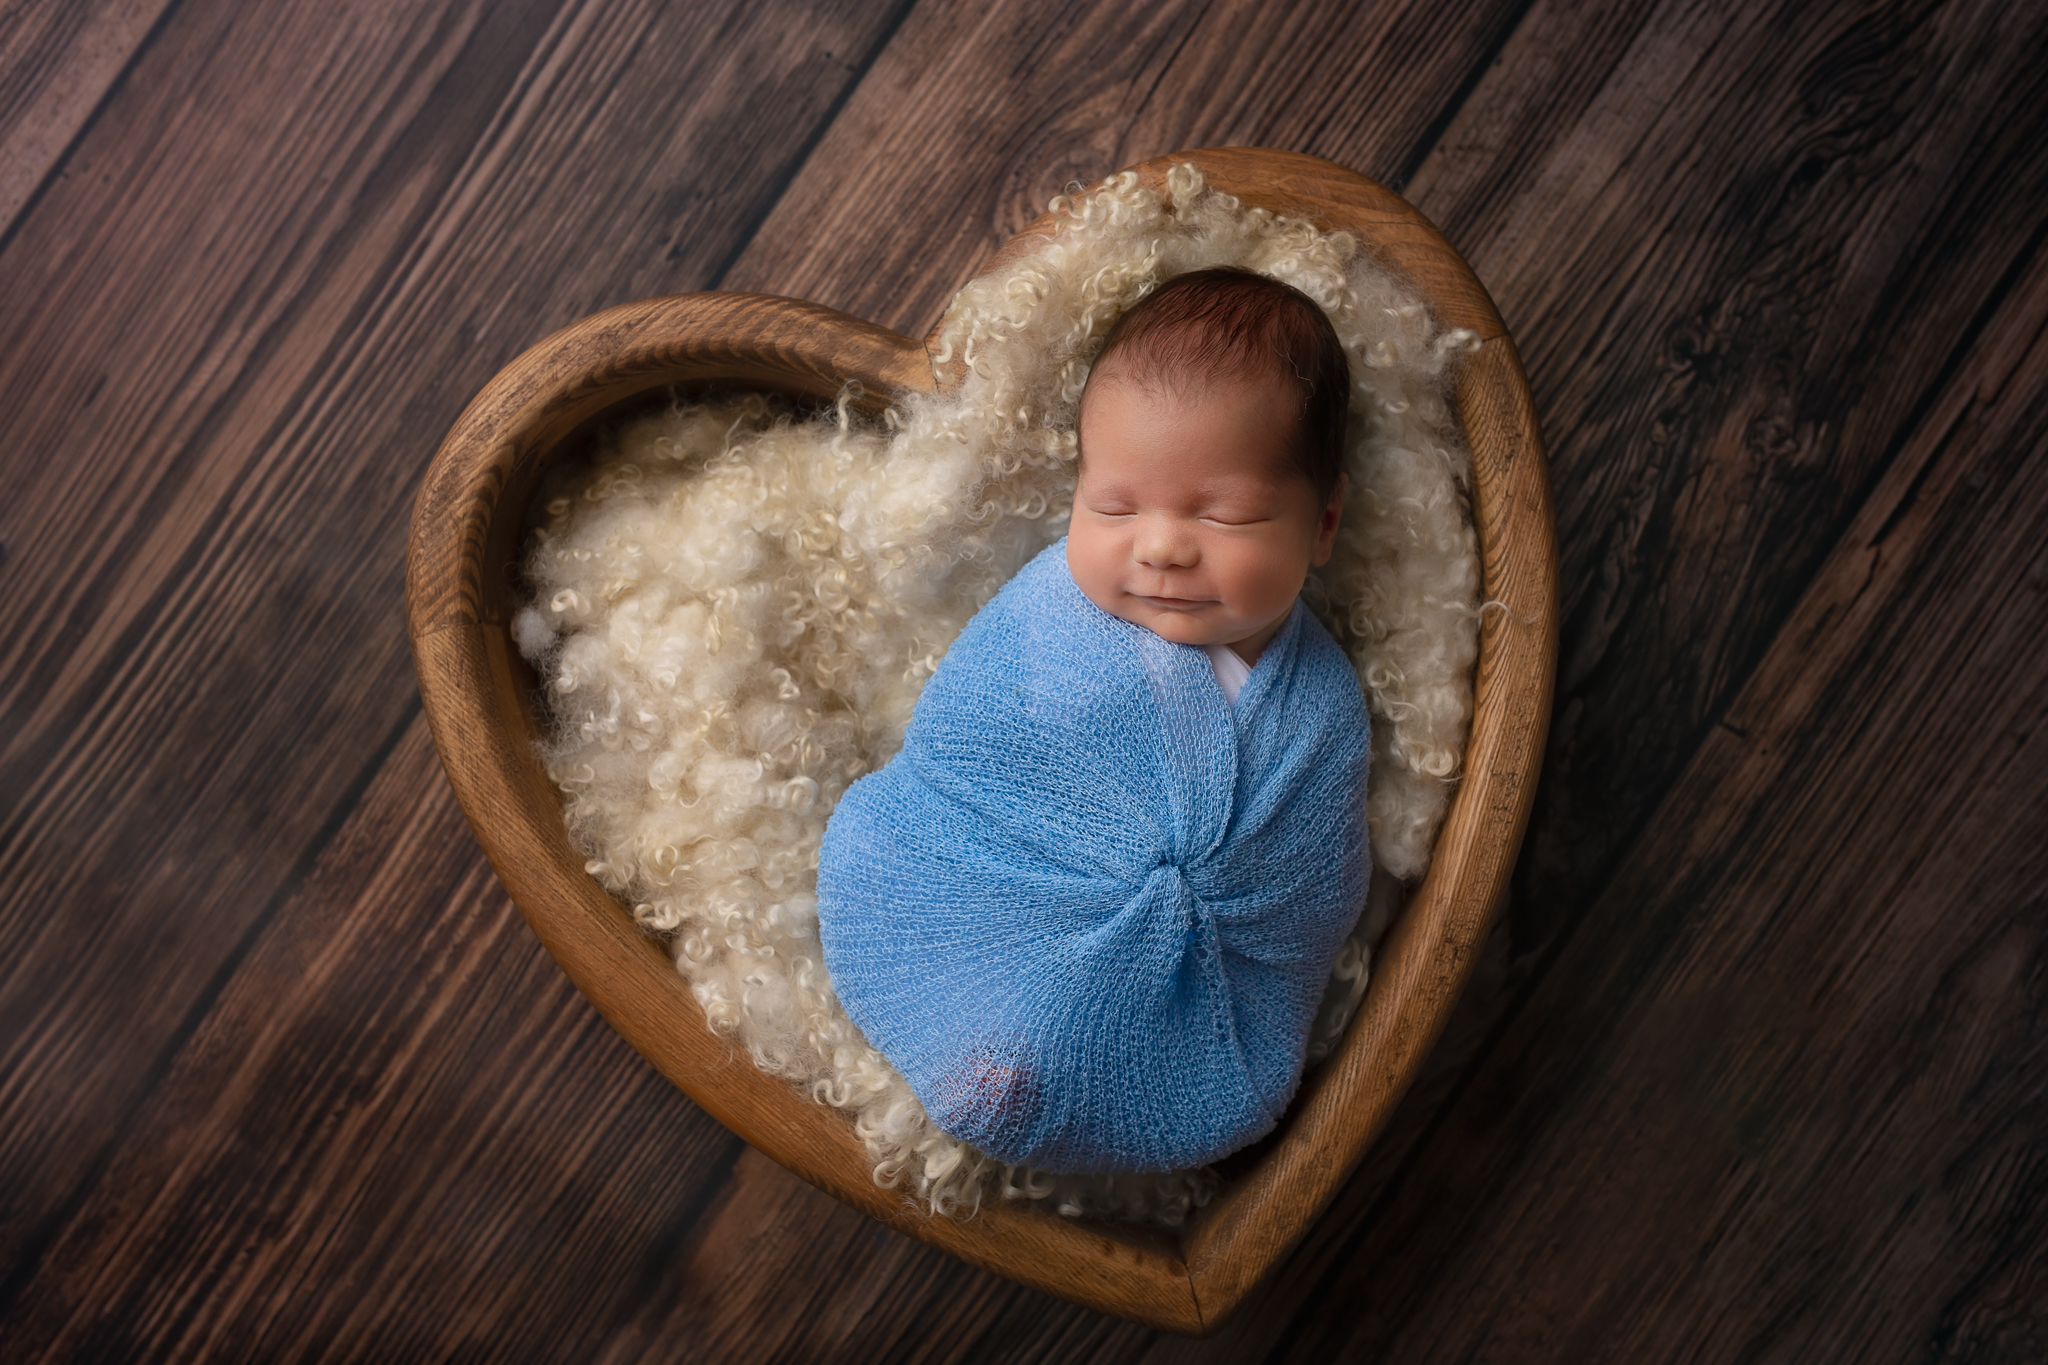 Newborn photographer Leeds, York, Bradford, Harrogate, Wakefield: newborn baby sleeping in a heart shaped bowl during his newborn photoshoot in Leeds, West Yorkshire